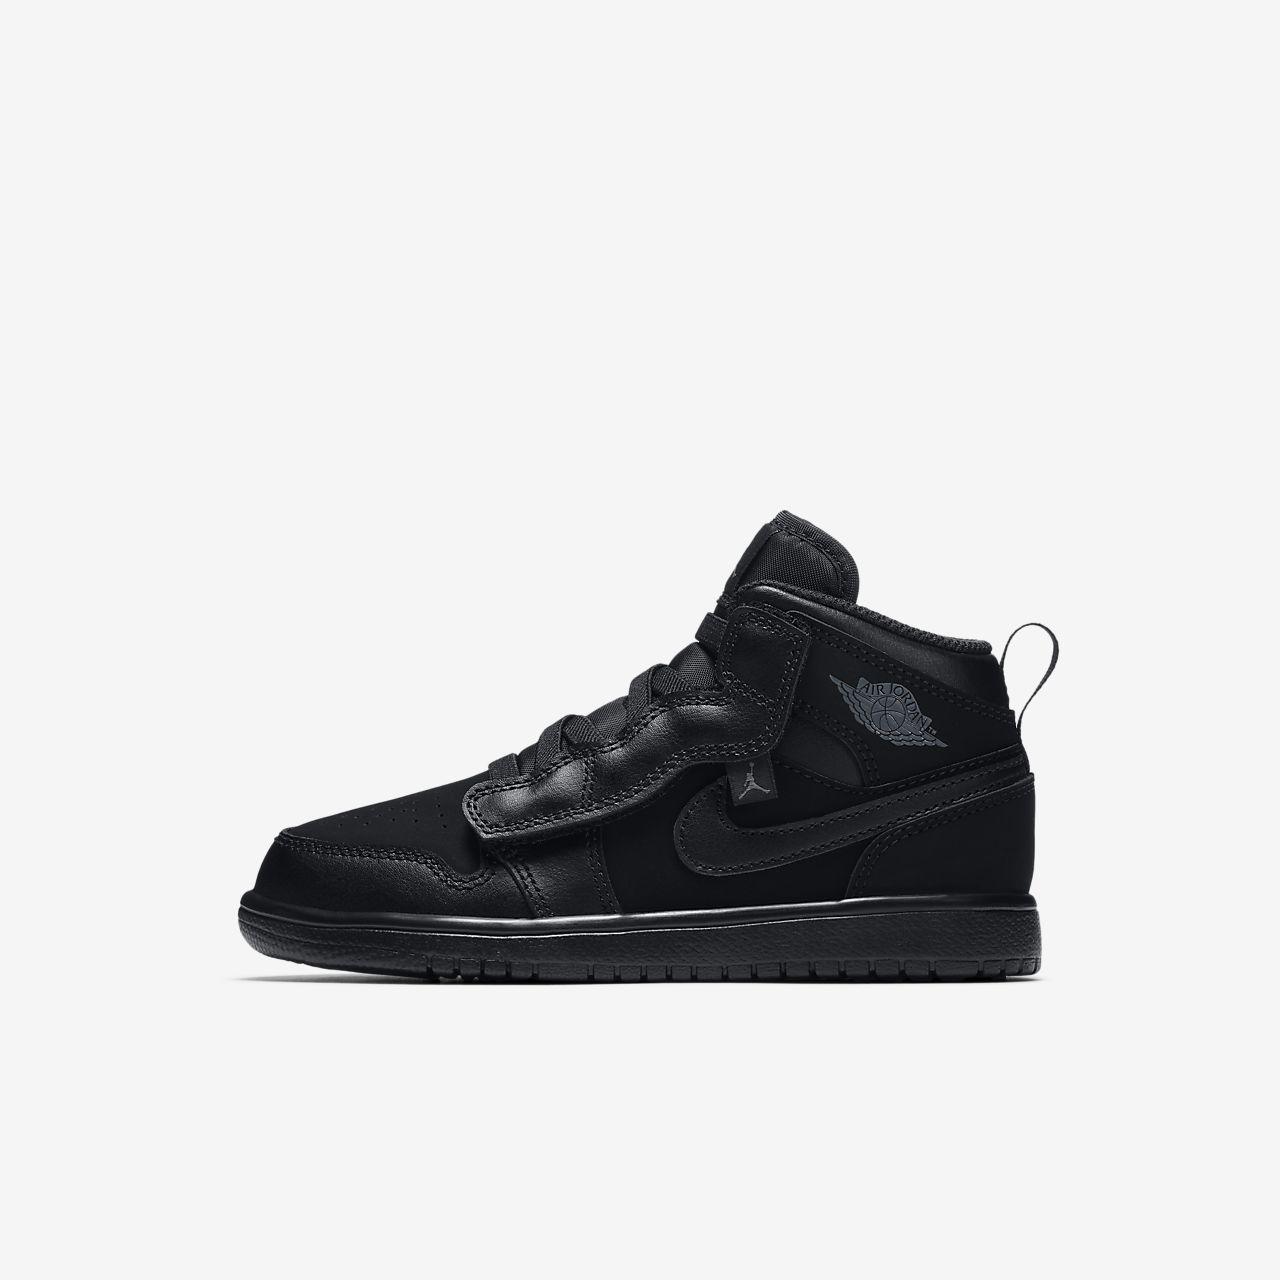 Air Jordan 1 Mid Alt Zapatillas - Niño a pequeño a. Nike.com ES 8f8c5ddad7aad